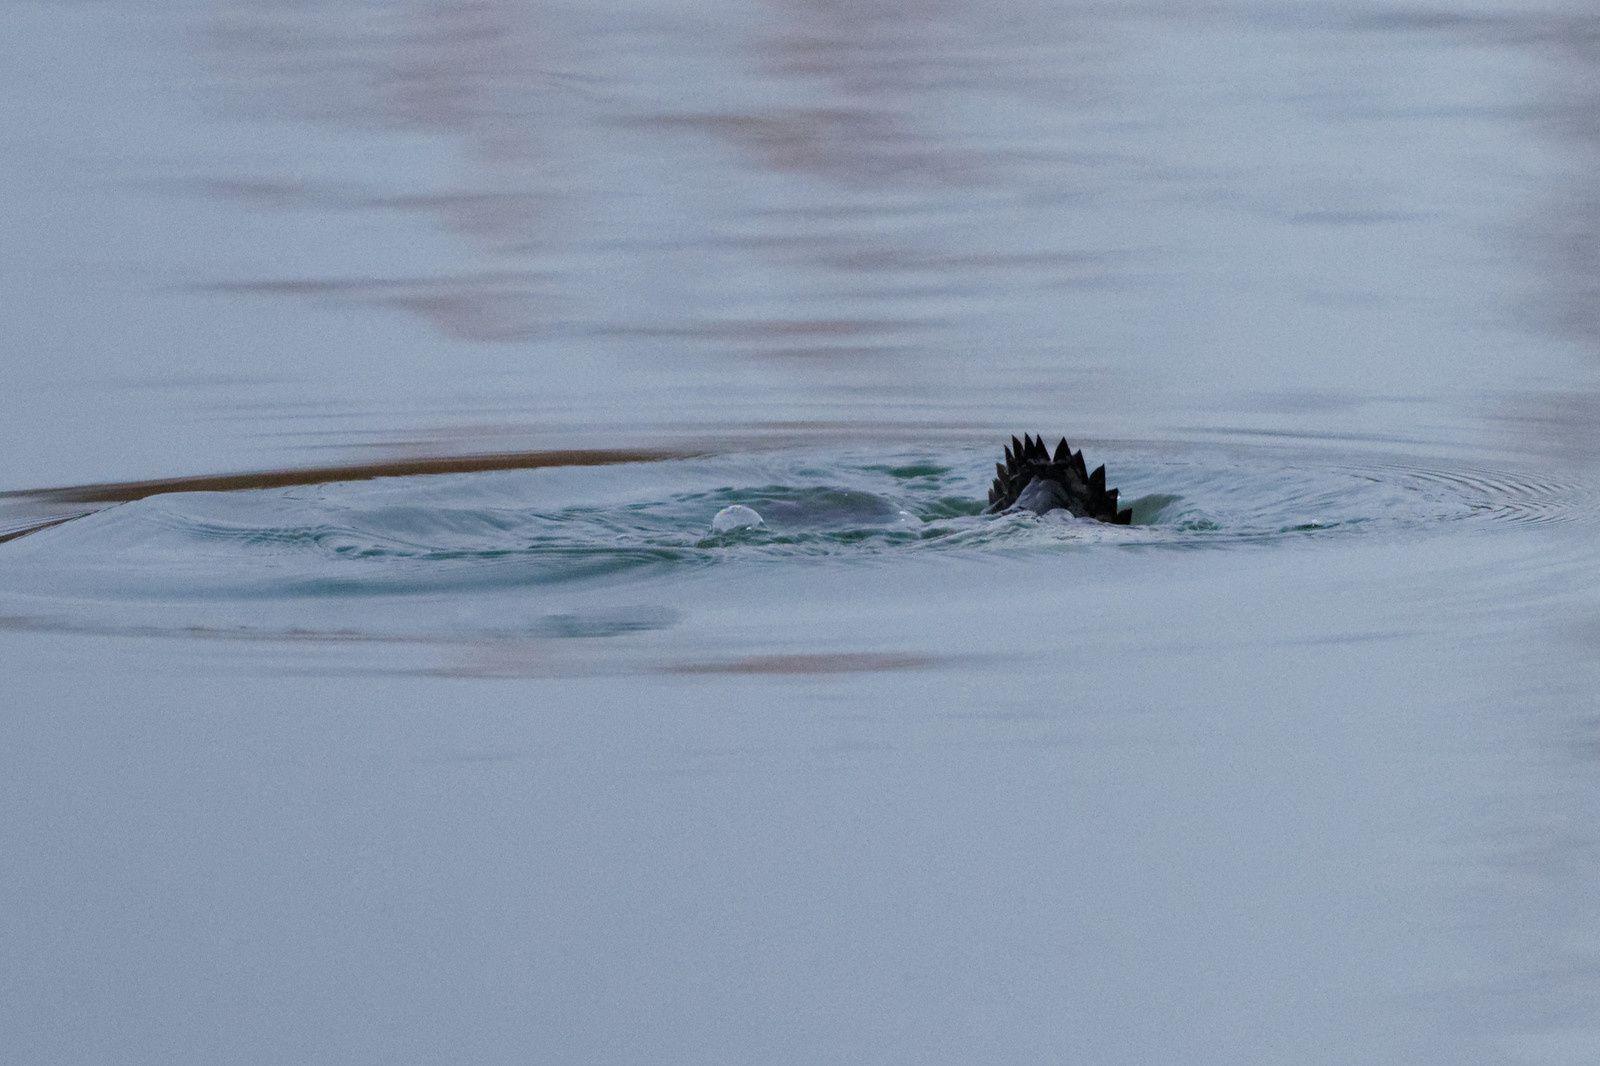 100 - Envol et plongeon : 11/01/2014